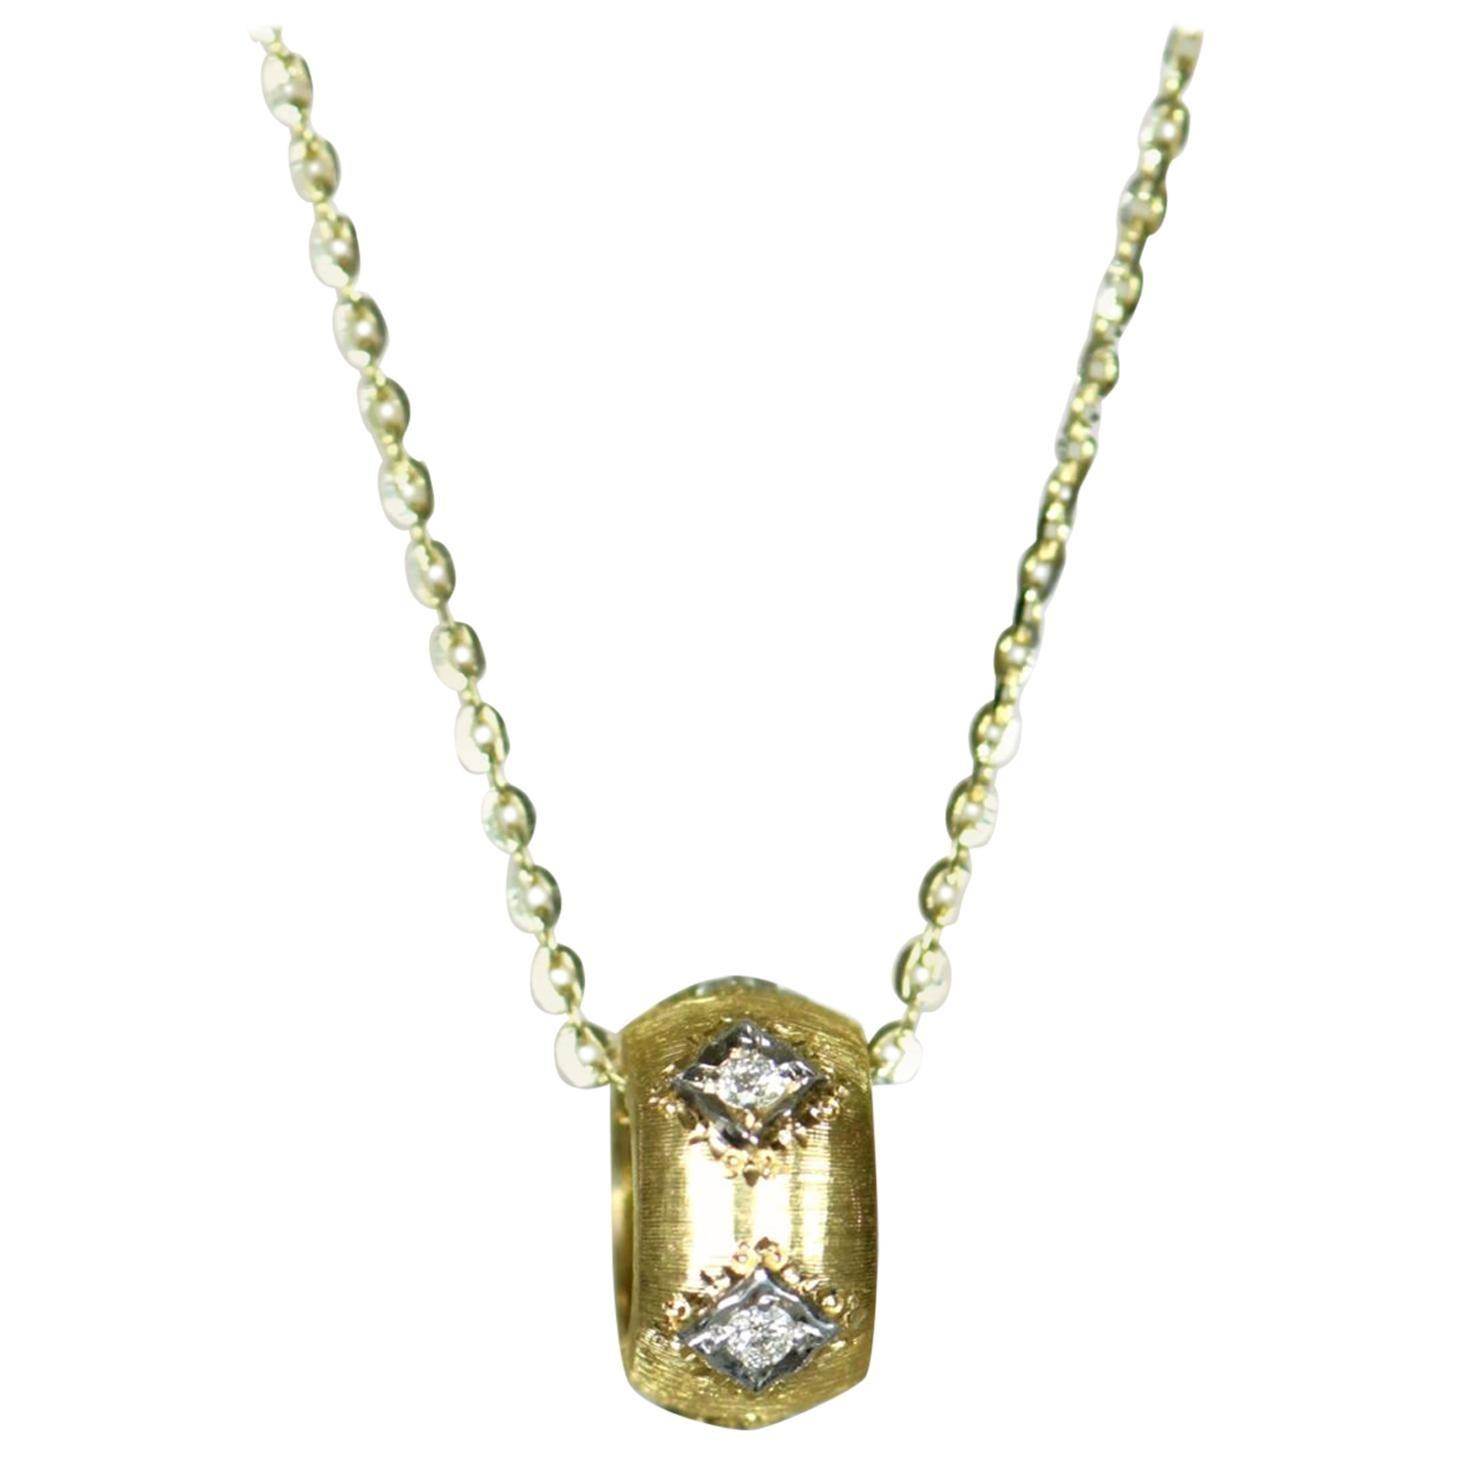 18 Karat Yellow Gold Diamond Pendant Necklace